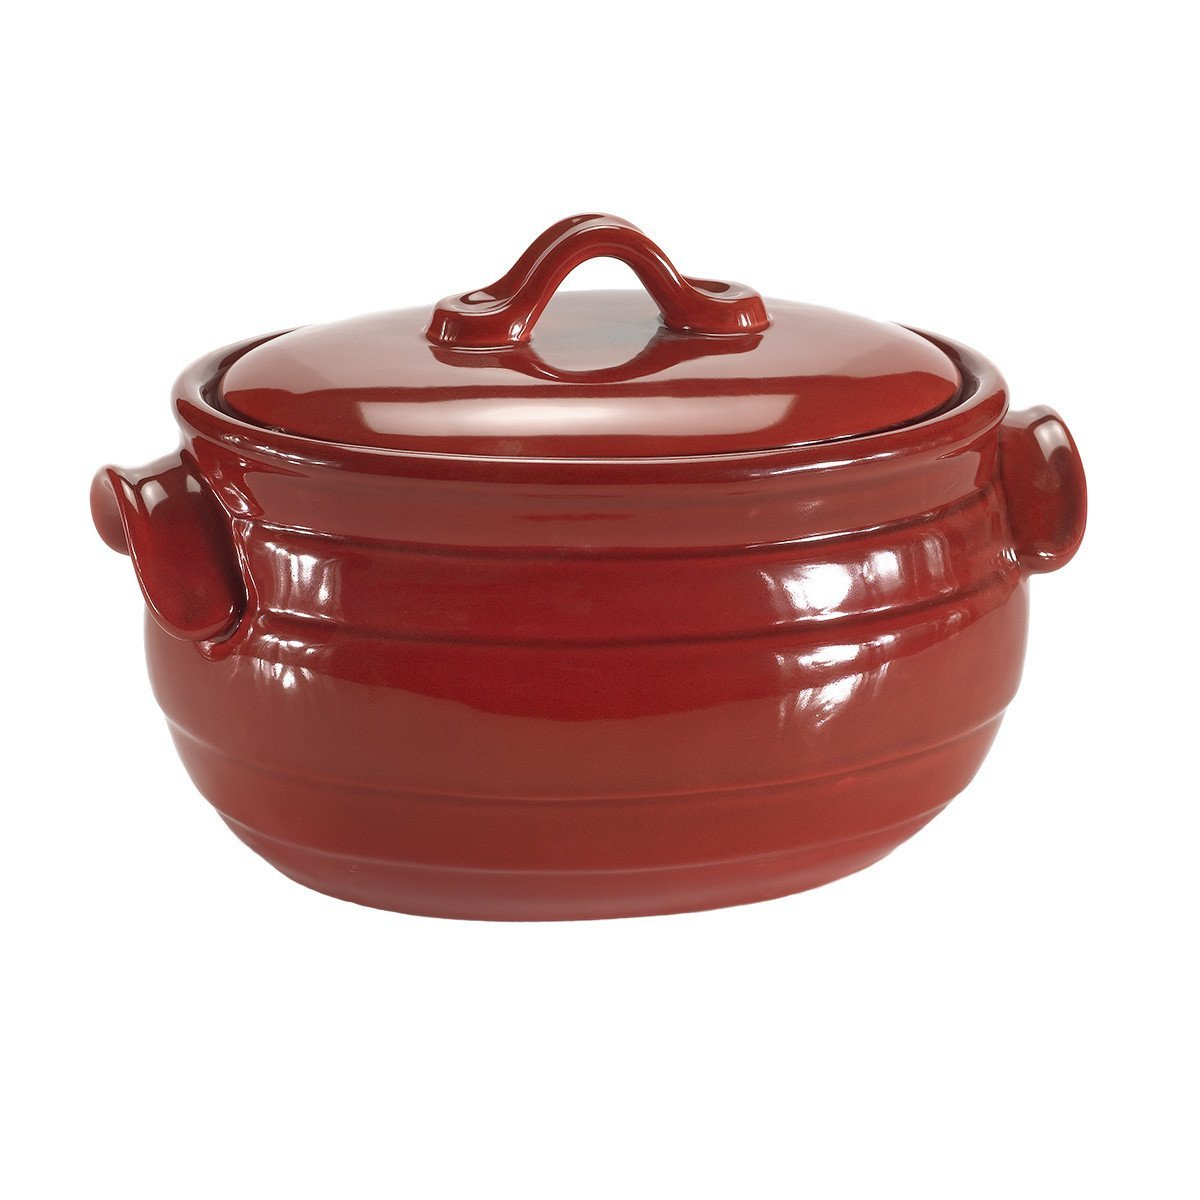 Celebrating Home Celebrations Bean Pot (stoneware casserole dish) - oven, microwave & dishwasher safe